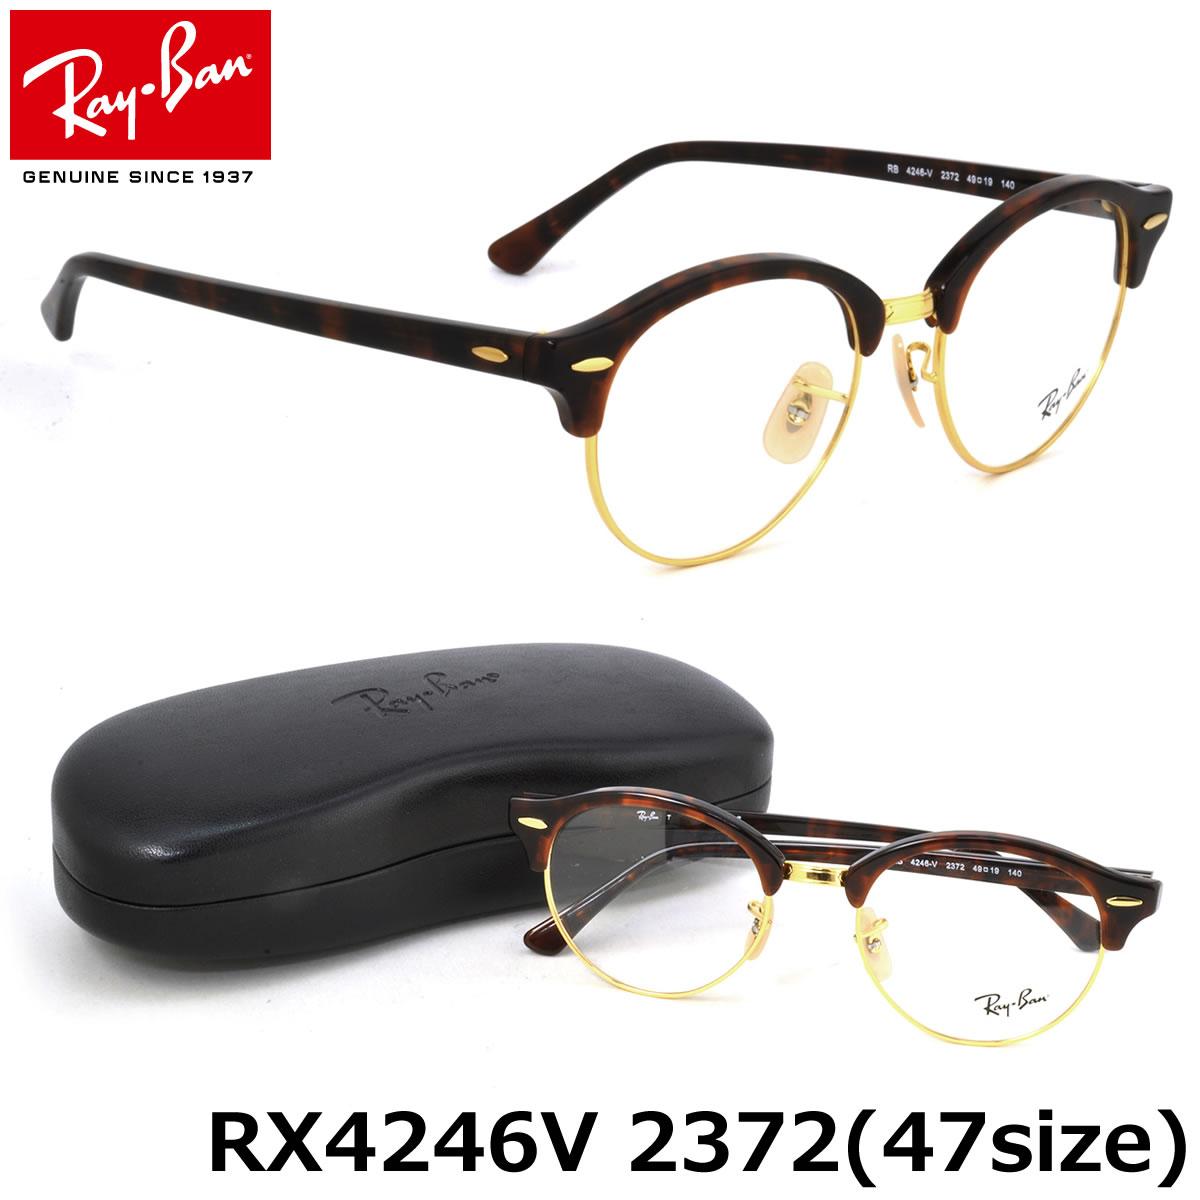 db3cc6a8e8 (Ray-Ban) glasses frames RX4246V2372 47 size clove round Club master round  round glasses Ray-Ban CLUBROUND men women